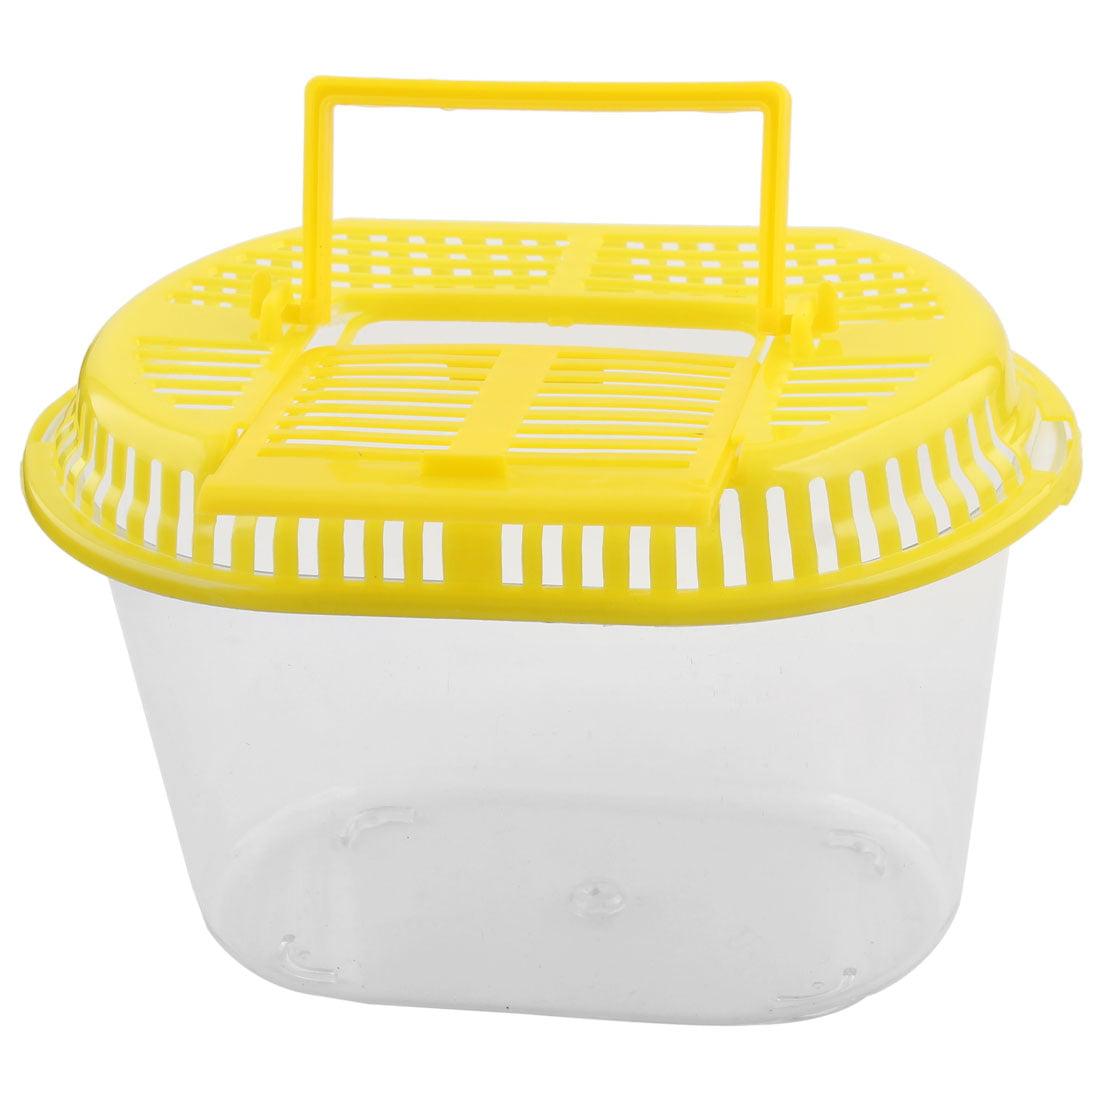 Plastic Household Decor Oval Design Aquarium Betta Fish Tank Pet Feed Box Yellow